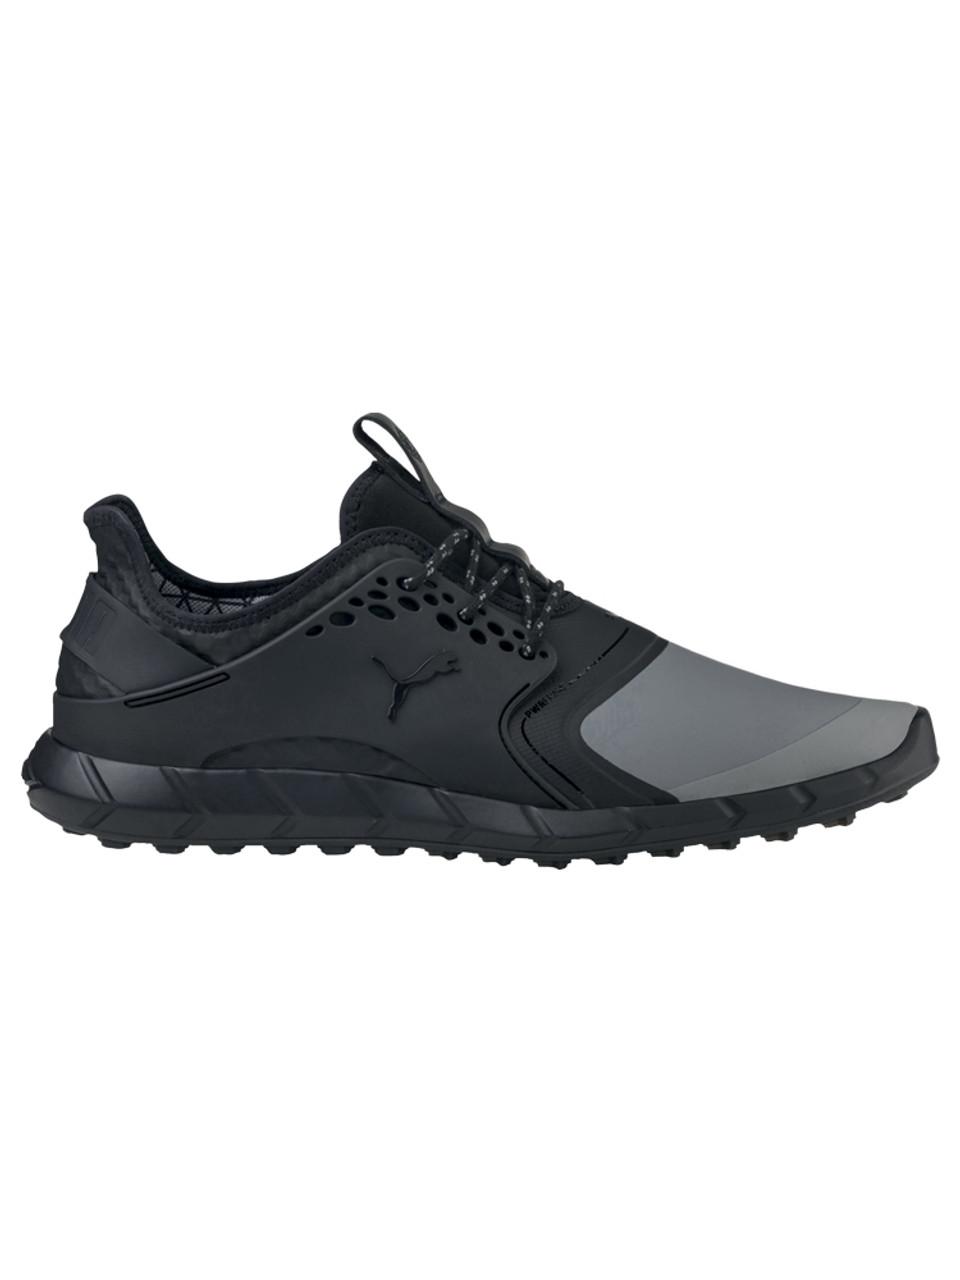 Puma Ignite PWRsport Pro Shoes Quiet ShadePuma Black